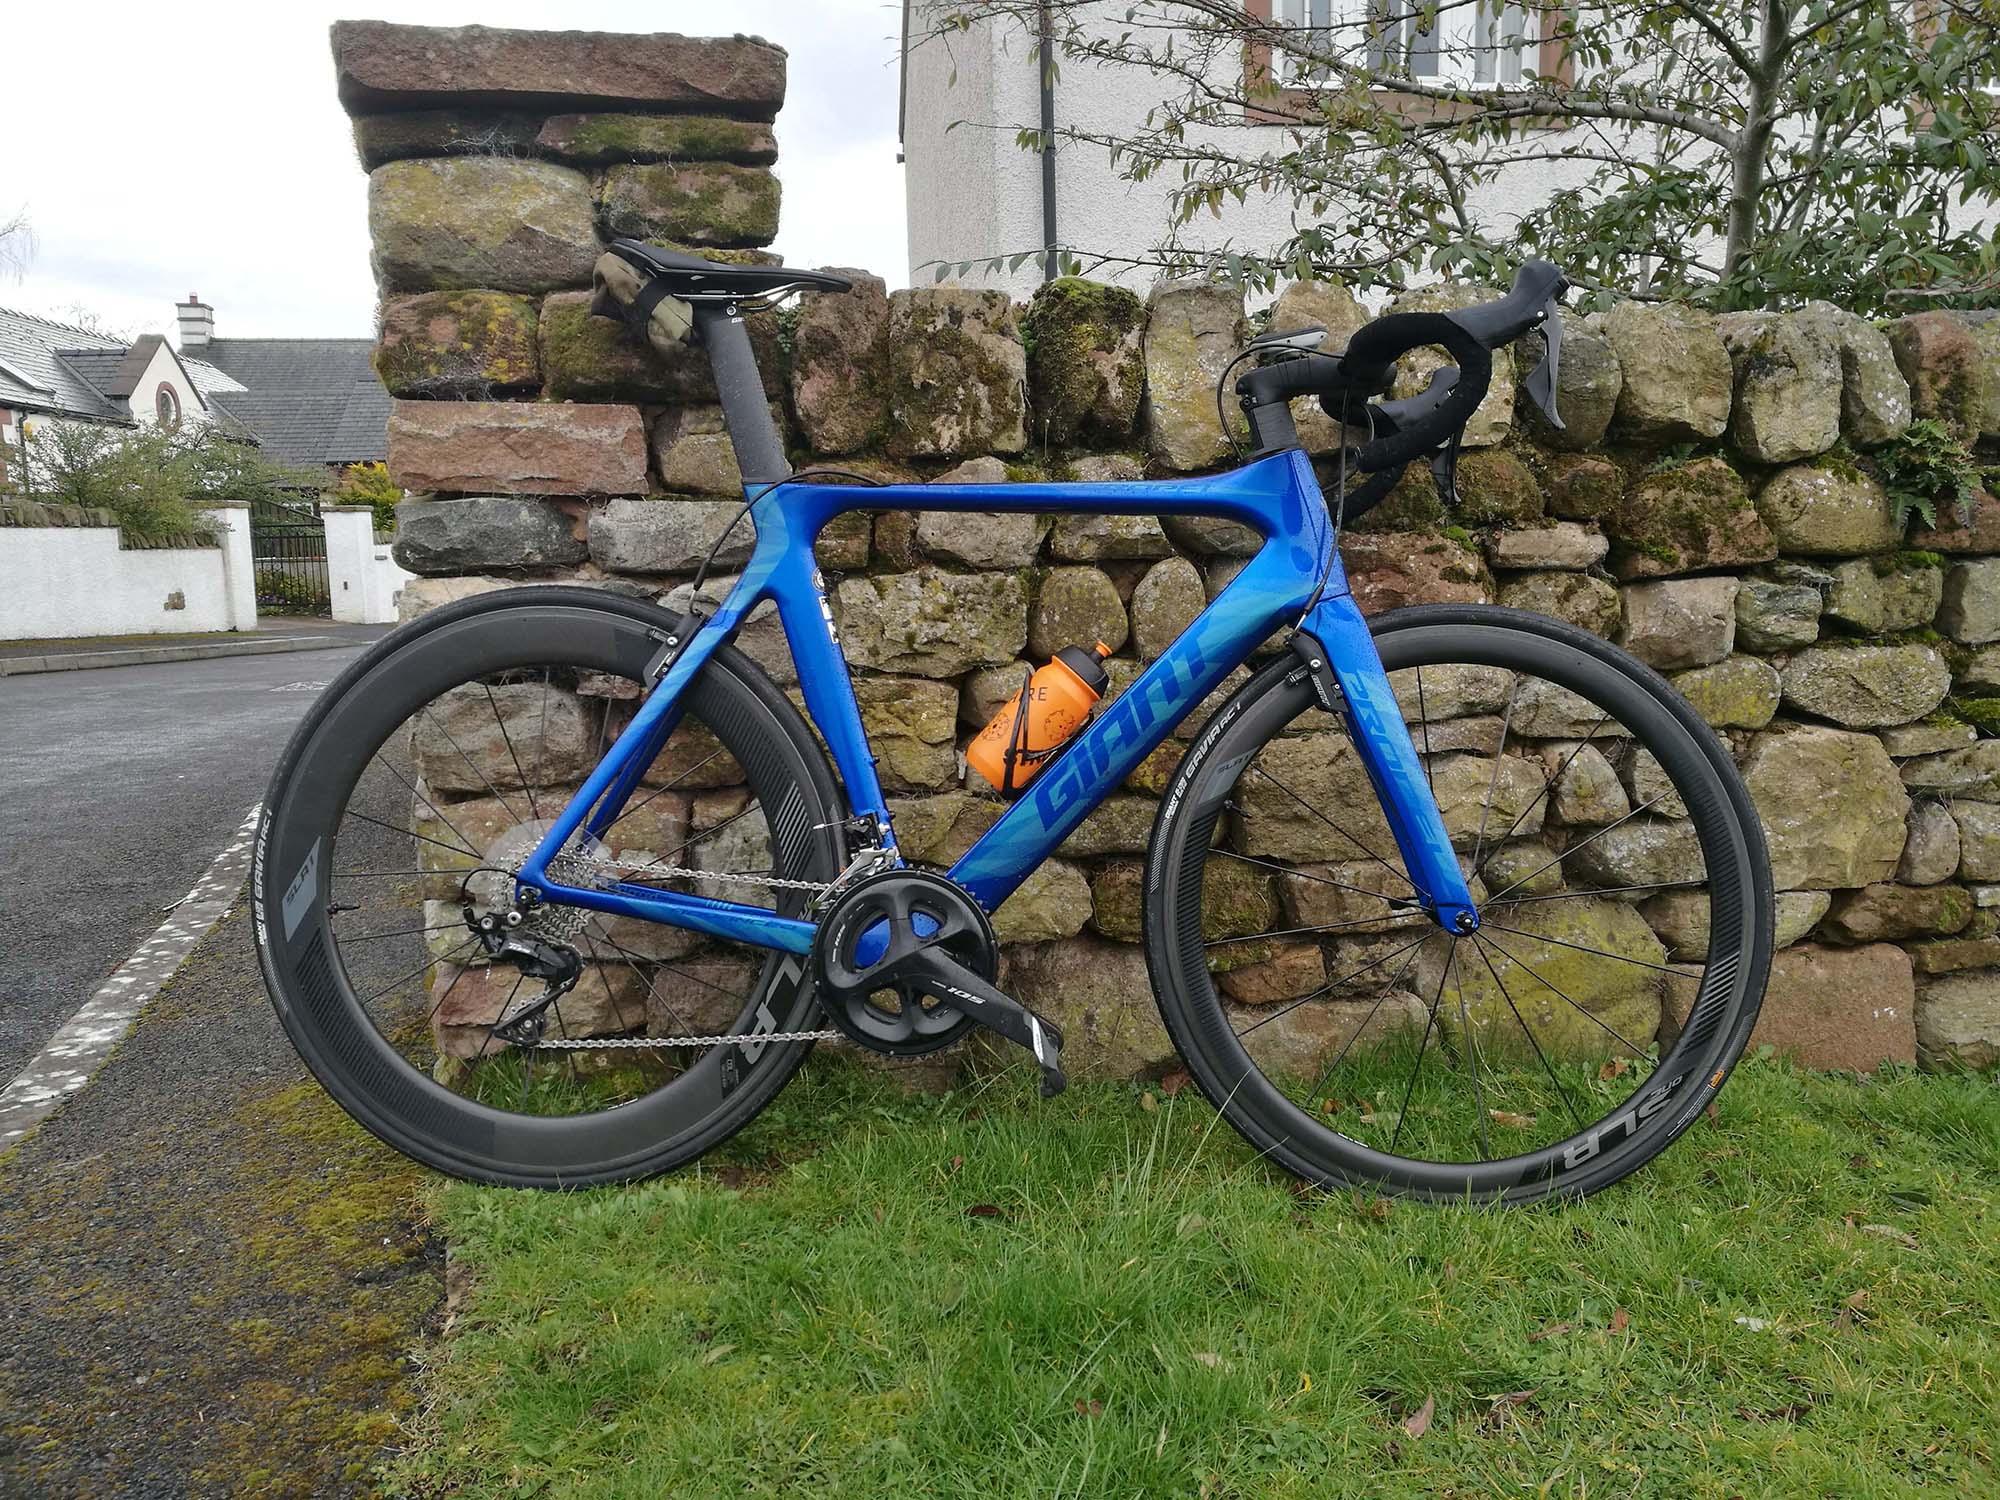 Road Bike Reviews: Giant Propel Advanced Pro 2